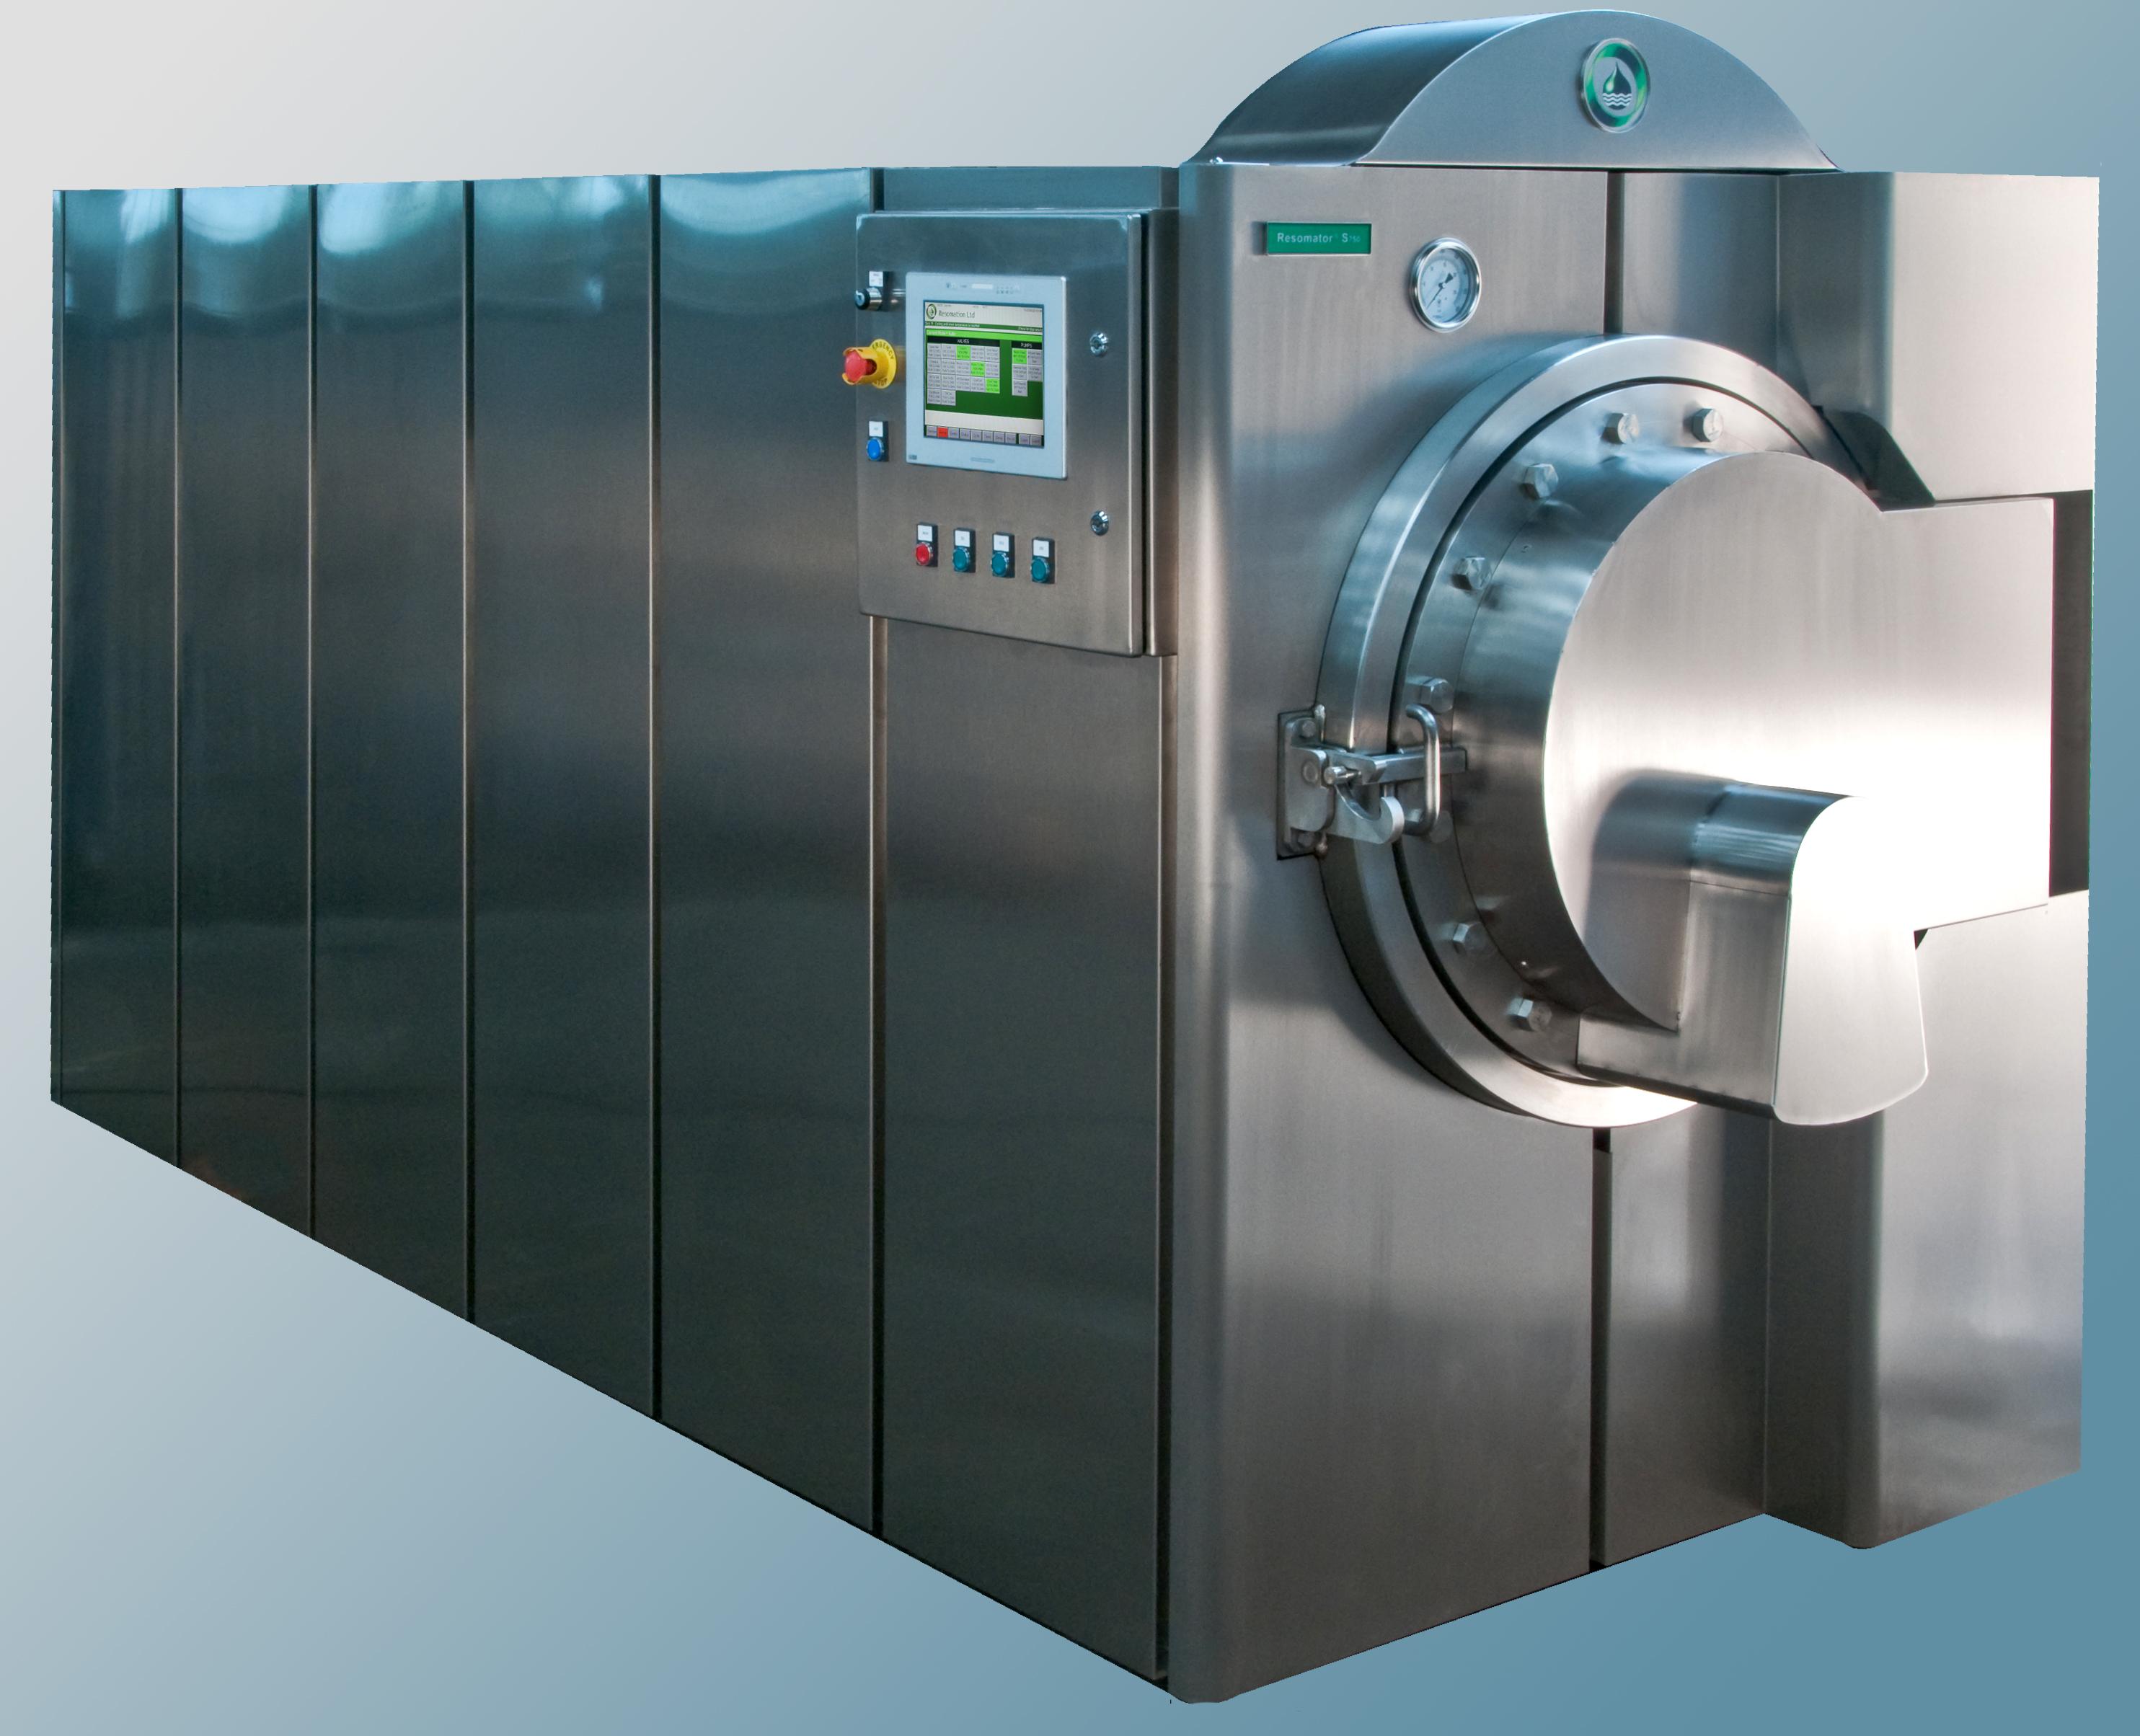 Resomator S750